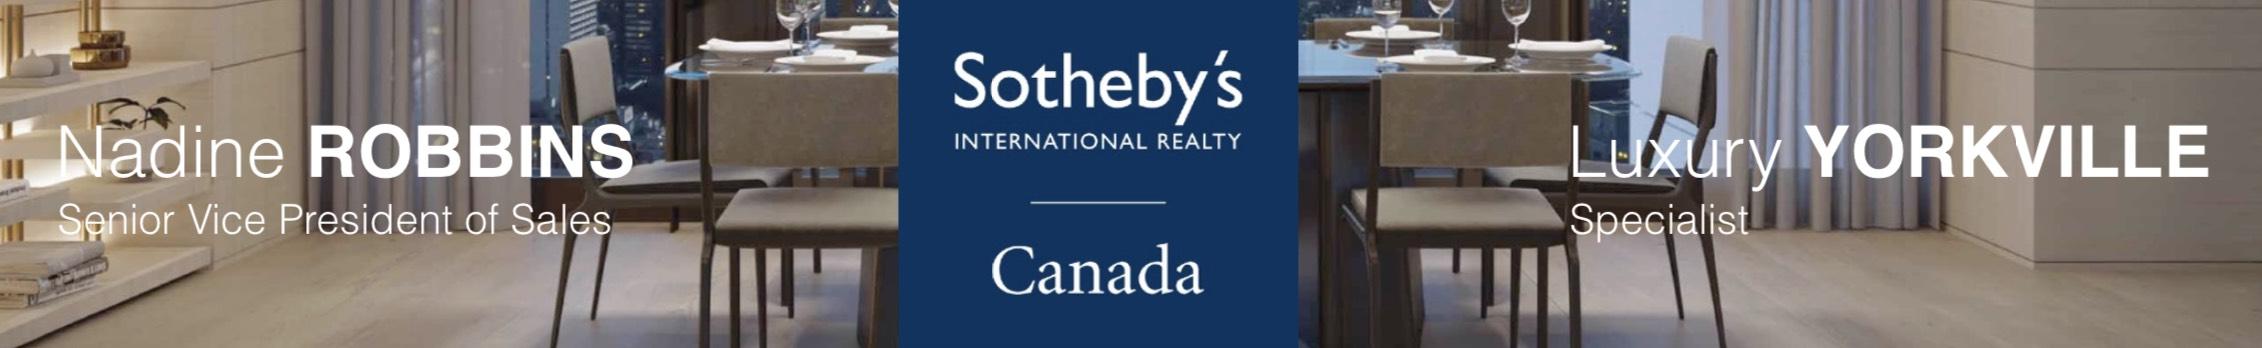 Nadine Robbins Sothebys Ad